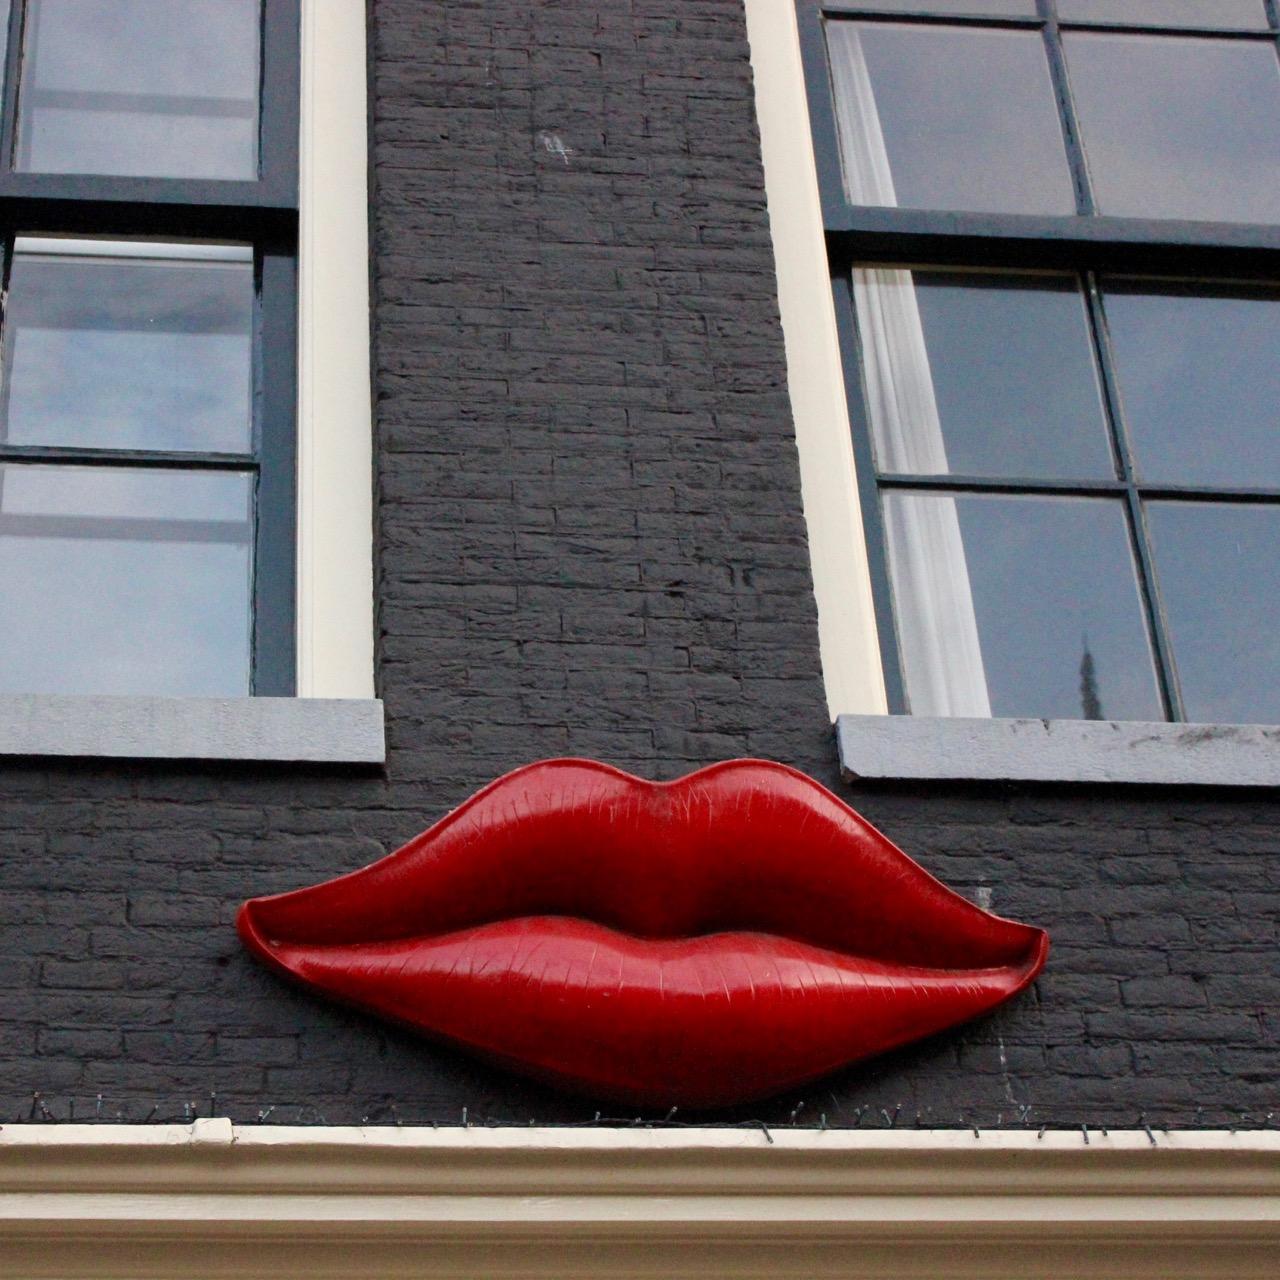 Amsterdam, Netherlands - 17